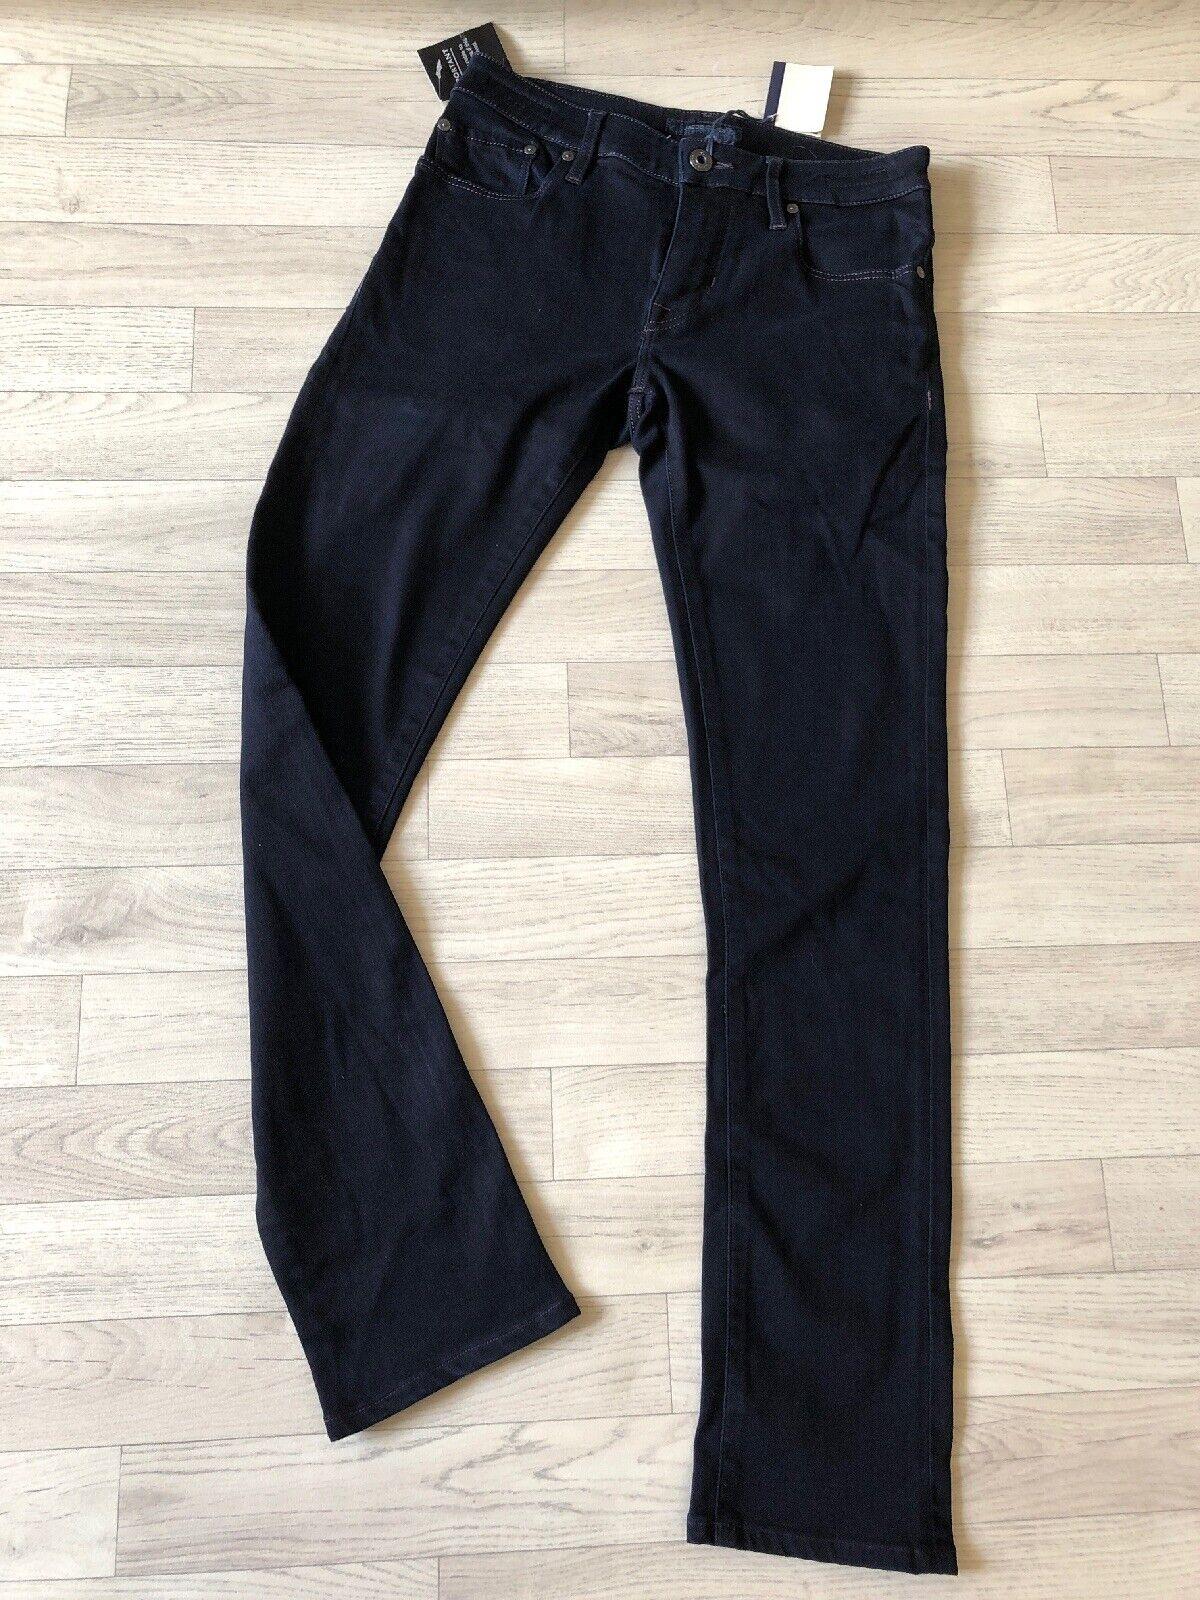 88f47ee160 Cohn Jeans da Uomo a Mano JACOB COHEN Slim Skinny Jeans W28 L30 XS ...